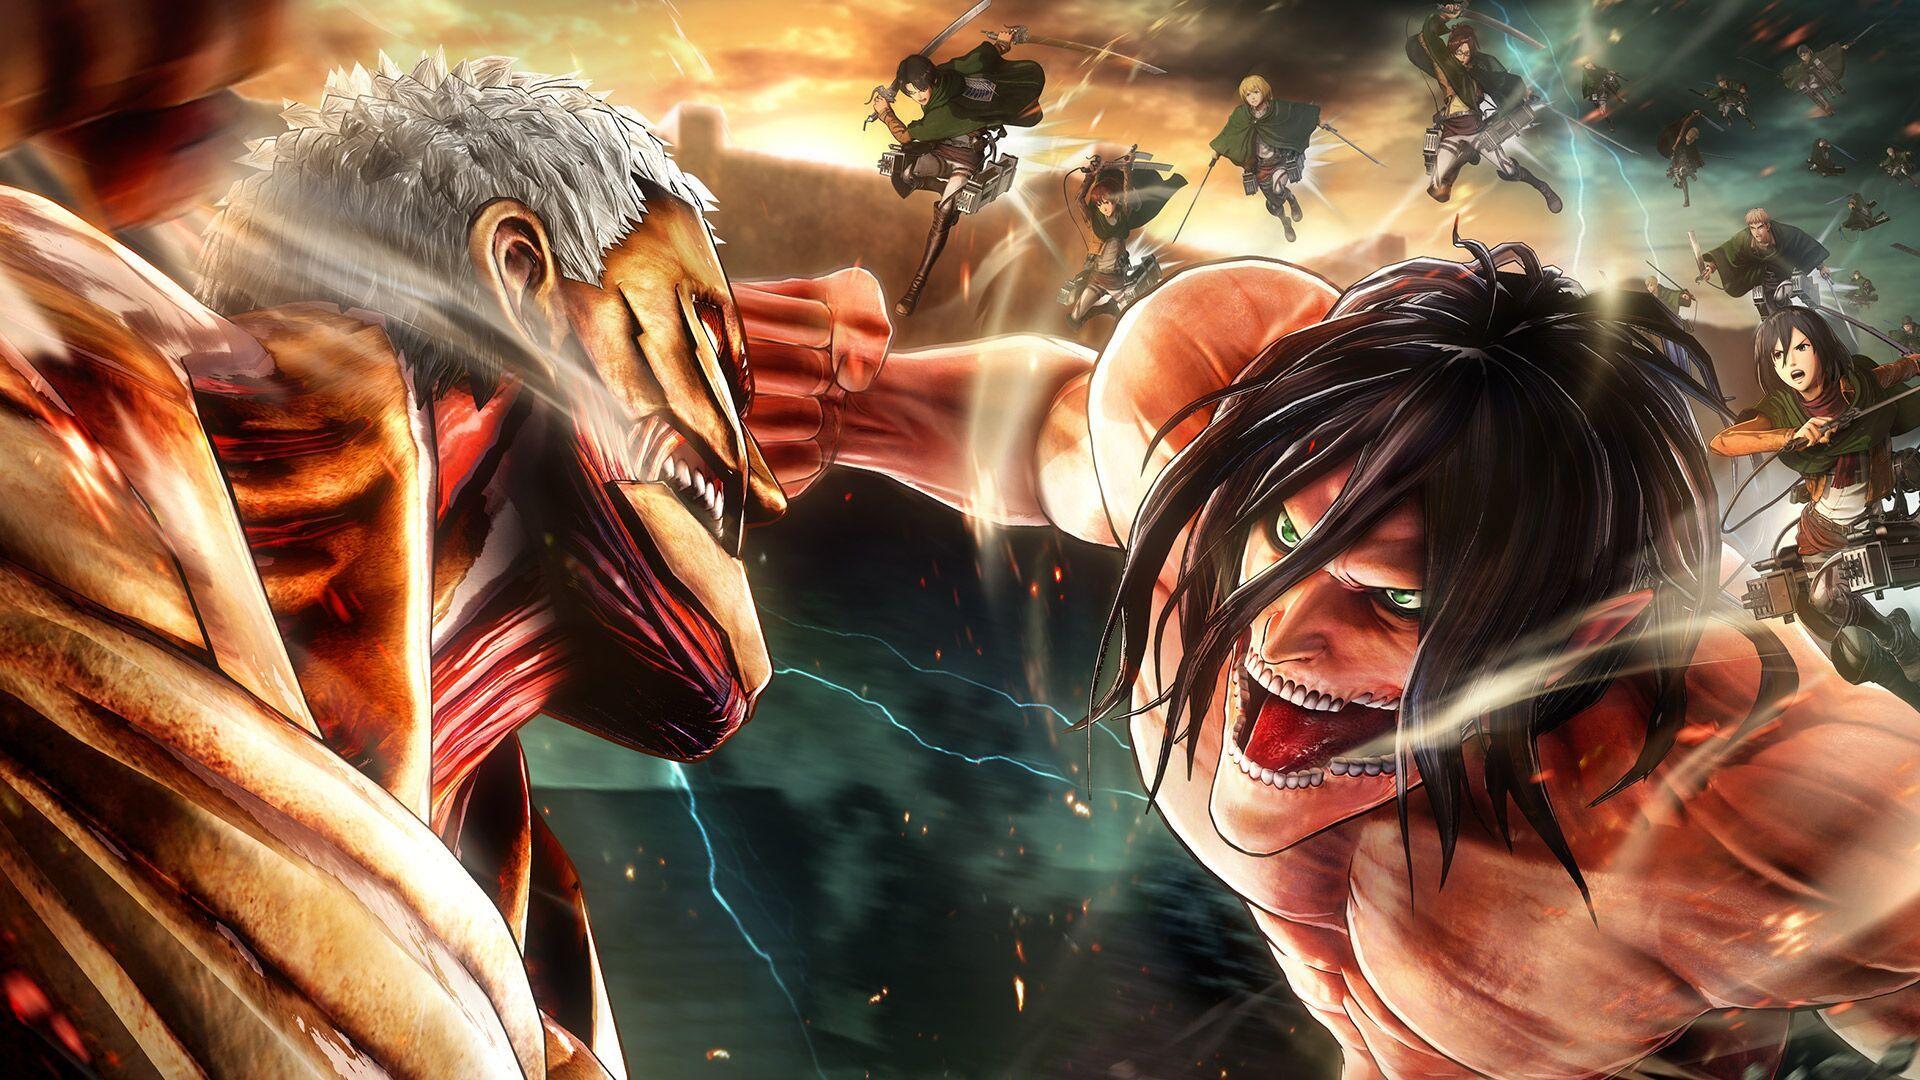 Attack on Titan 2: Final Battle Impression - RPGamer